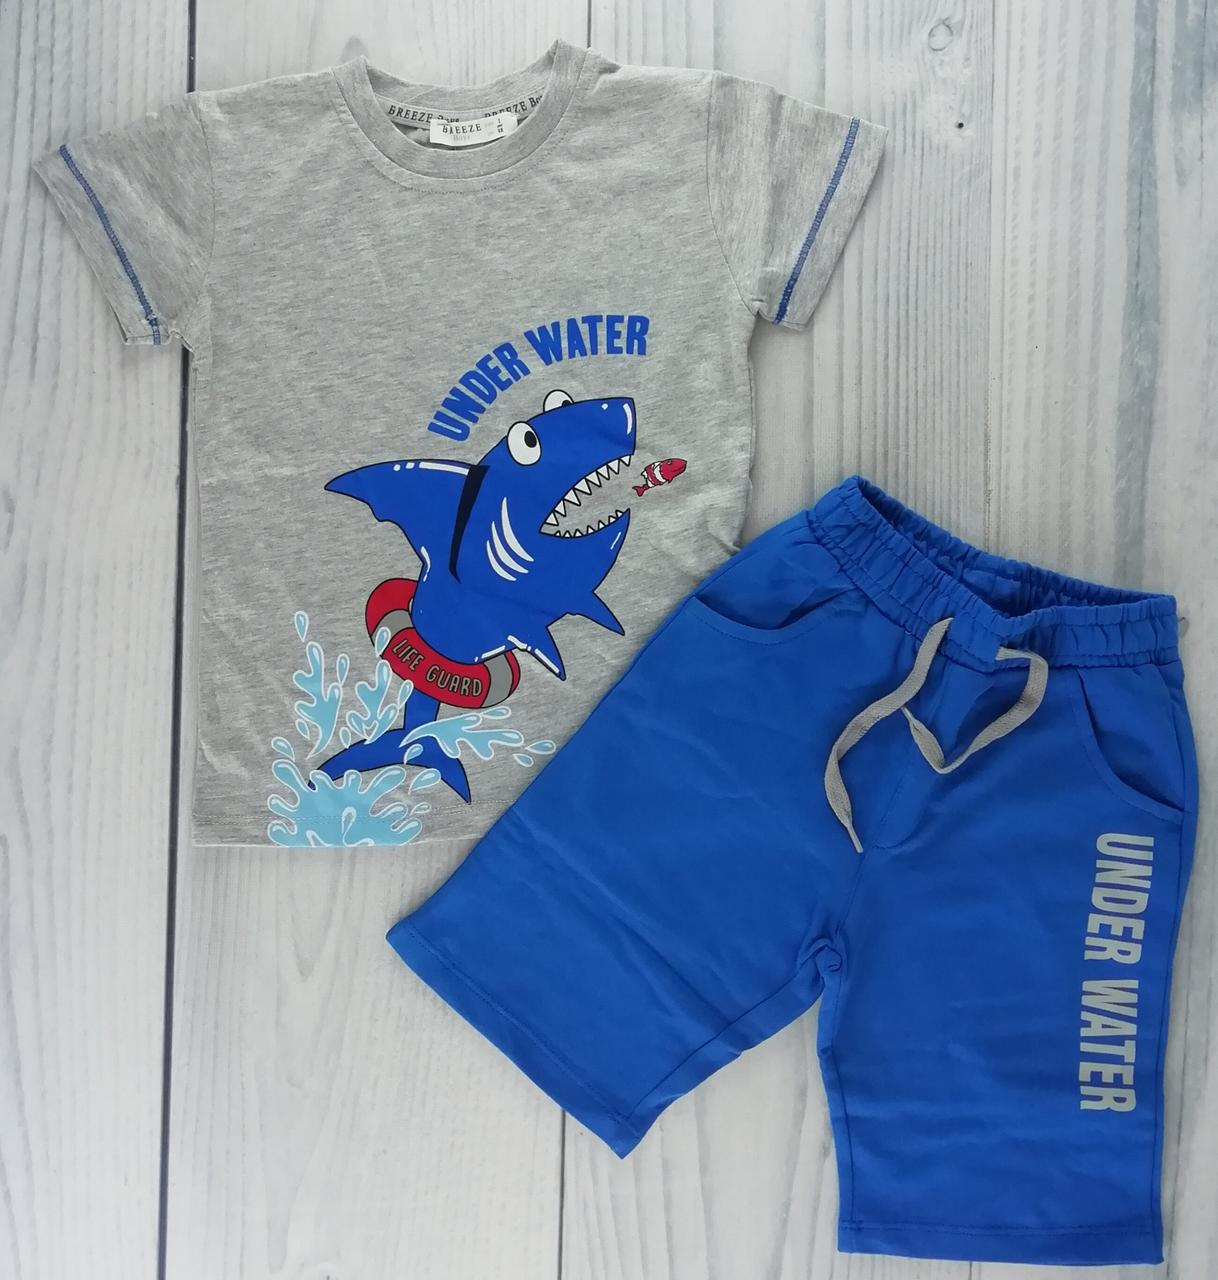 2c6c532b92f27 Комплект для мальчика: Футболка + шорты Акула Синий Хлопок Breeze Турция